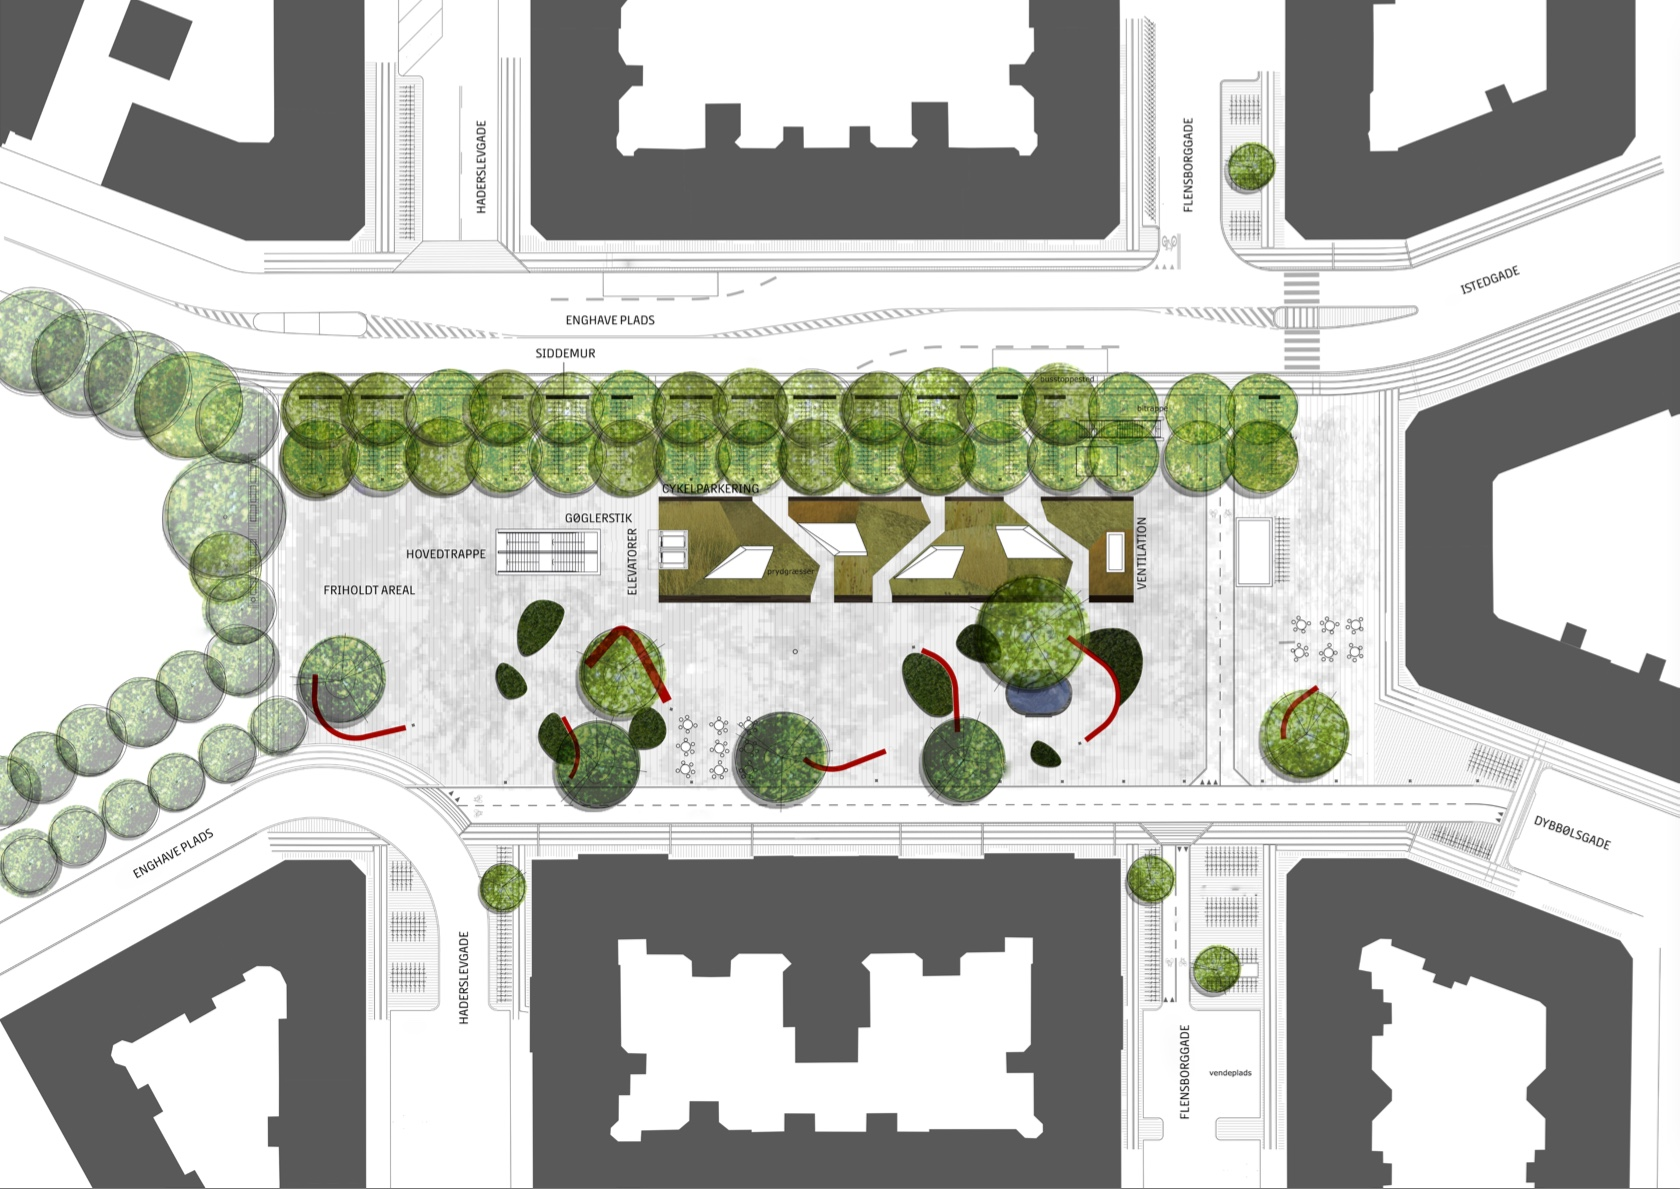 Enghave Plads plan.jpeg